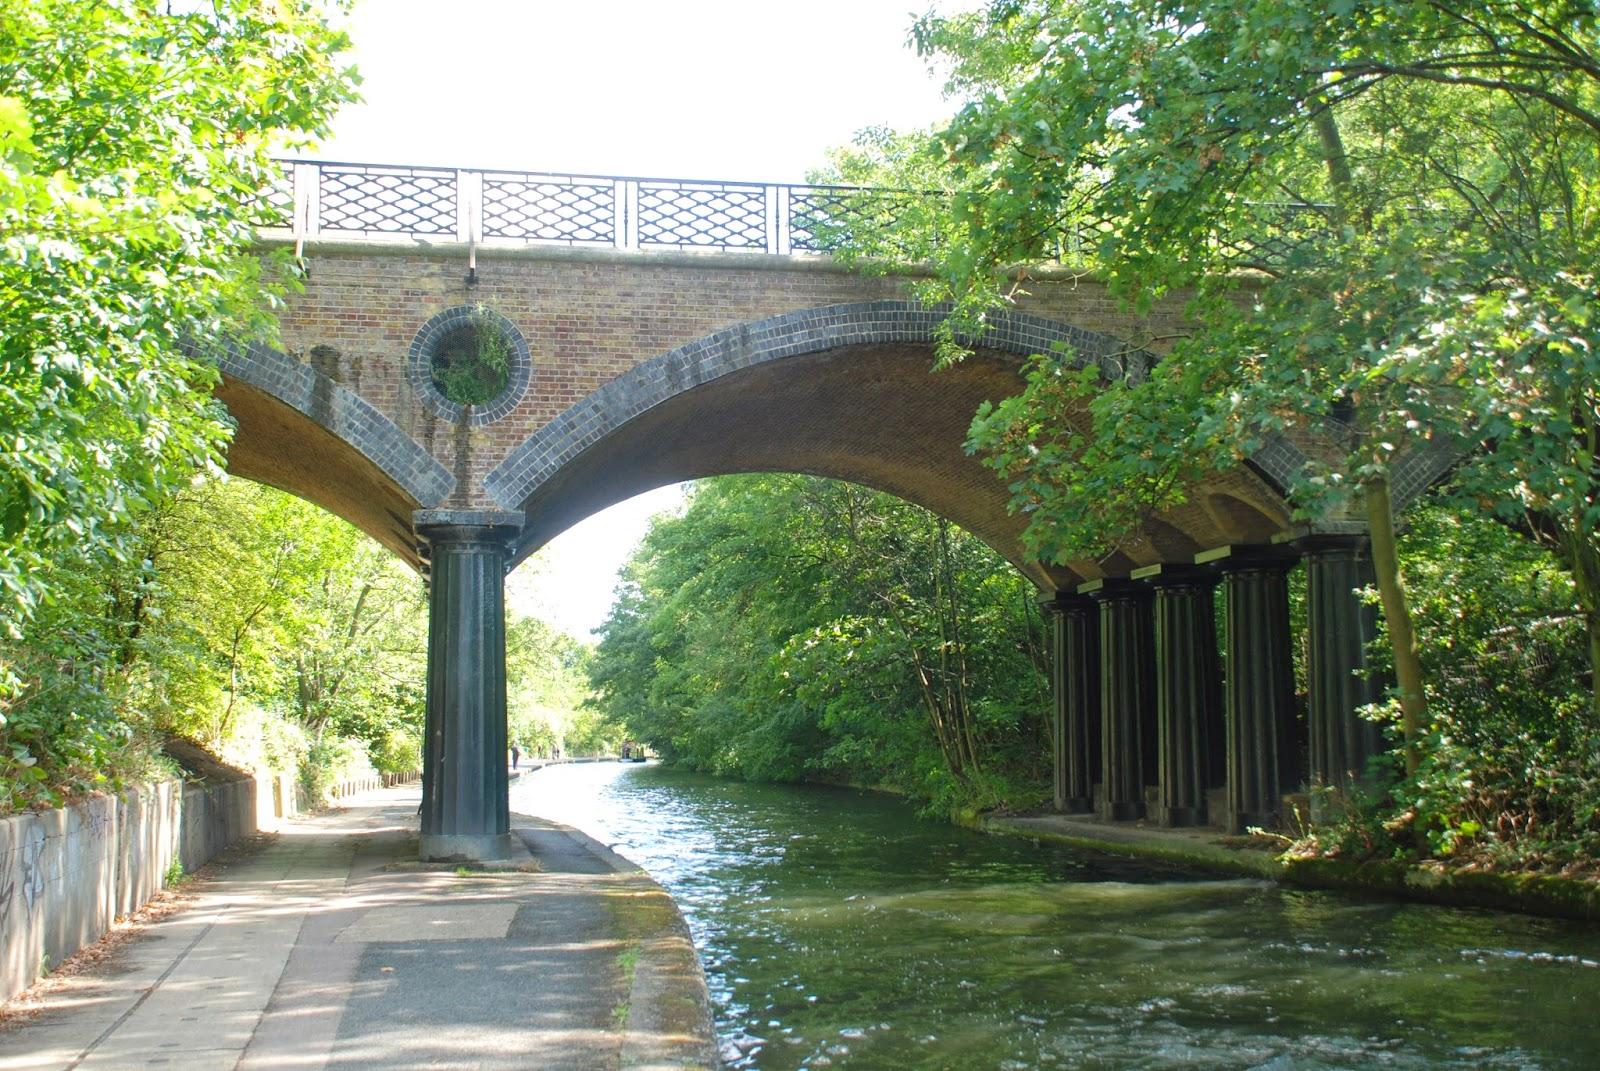 Macclesfield Bridge,Regent's Canal, London